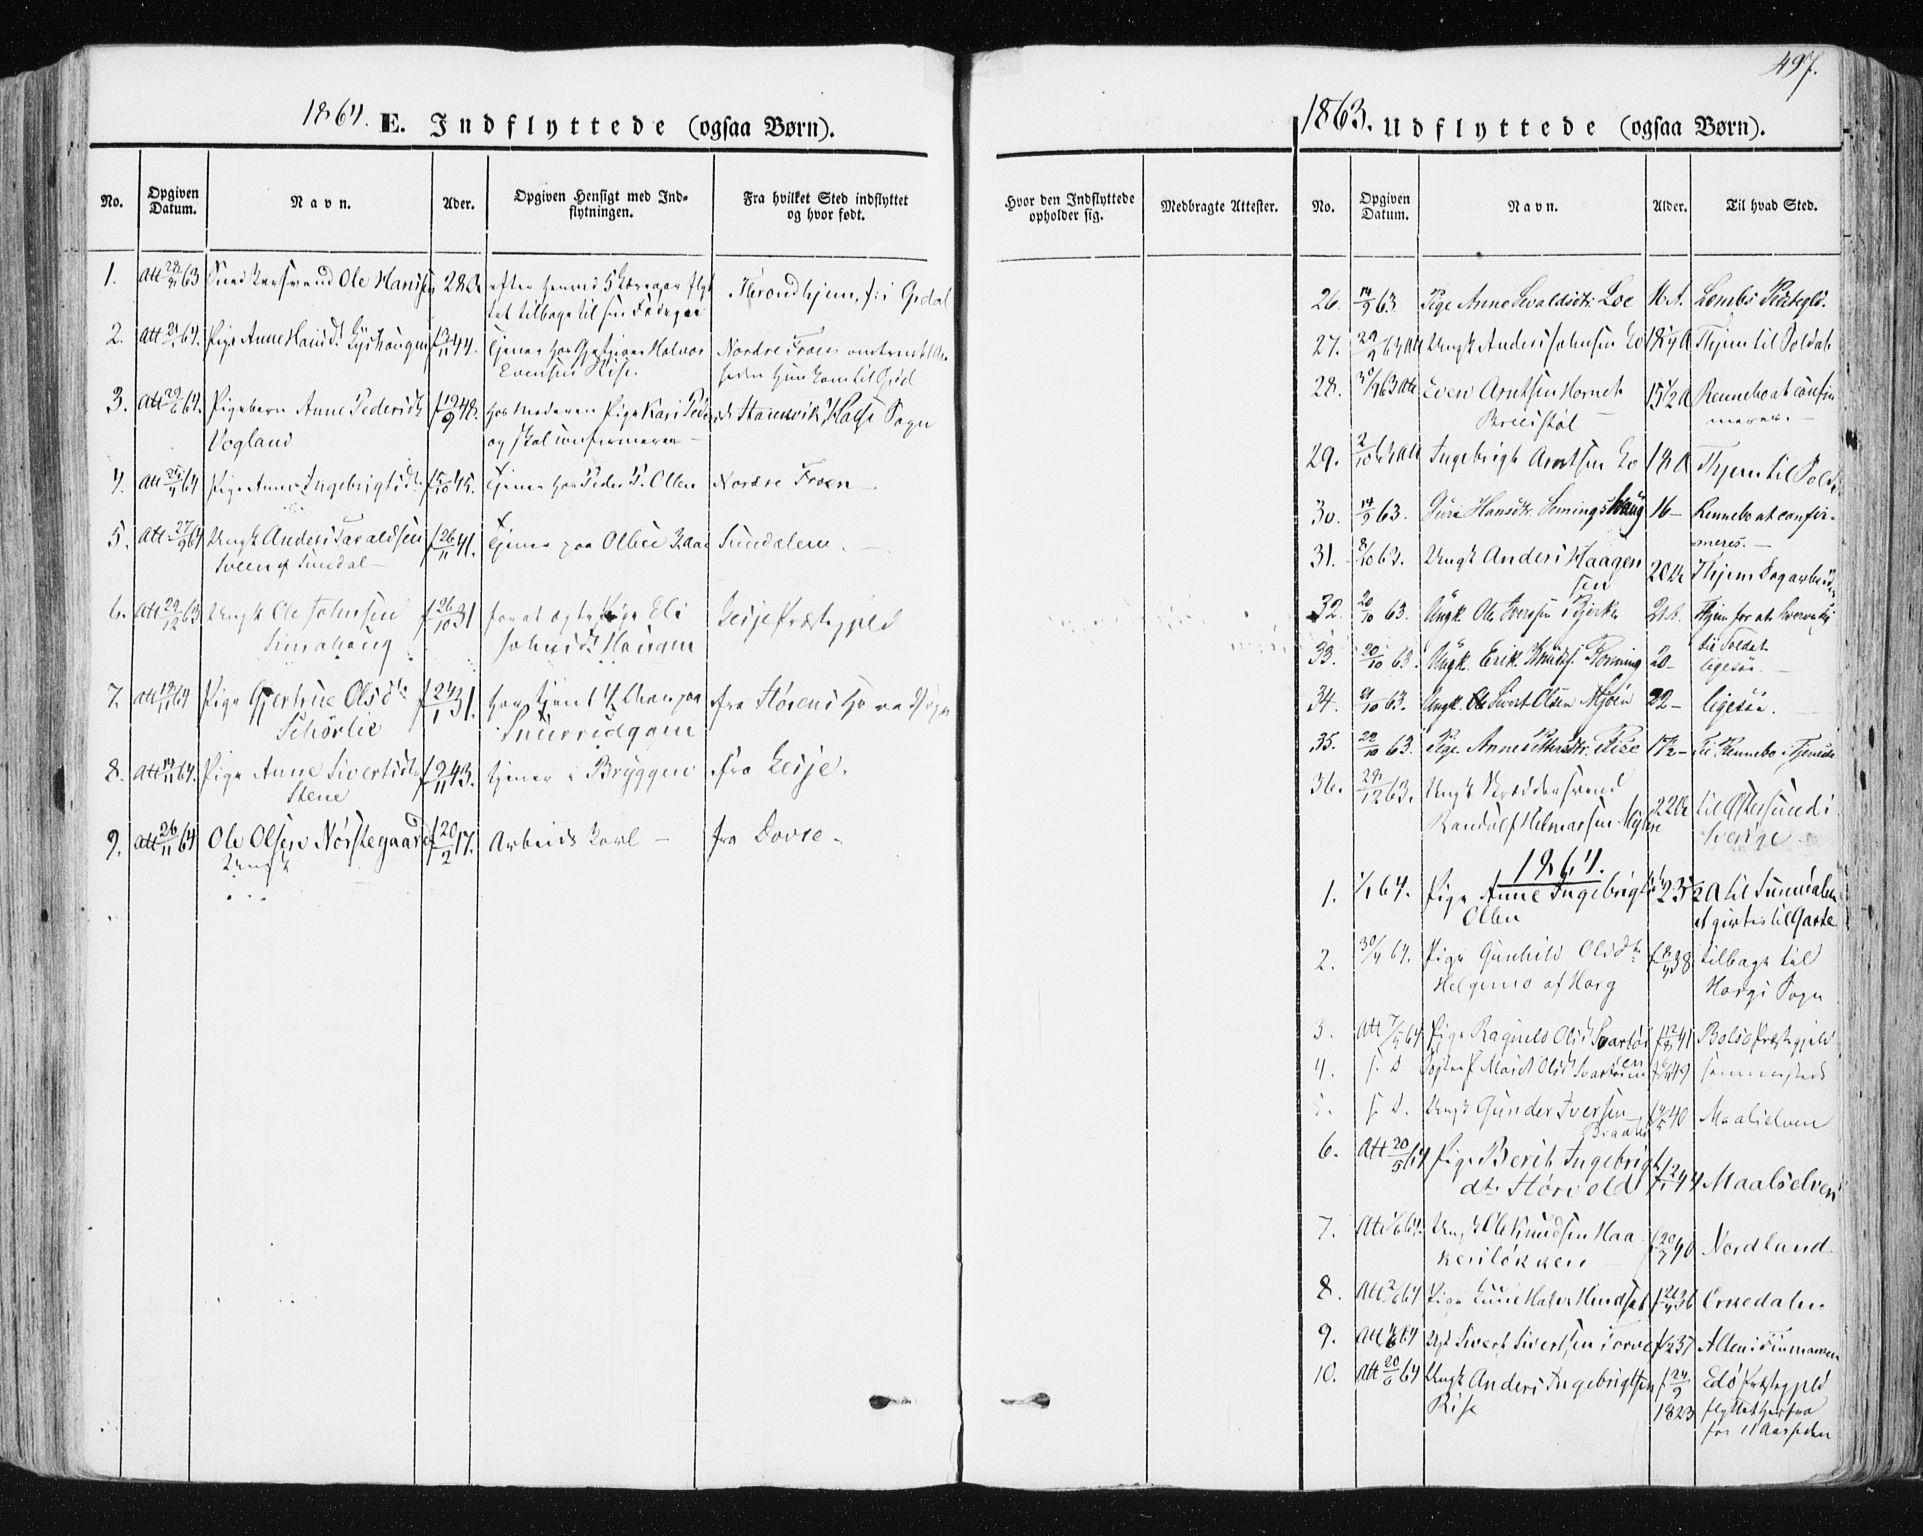 SAT, Ministerialprotokoller, klokkerbøker og fødselsregistre - Sør-Trøndelag, 678/L0899: Parish register (official) no. 678A08, 1848-1872, p. 497